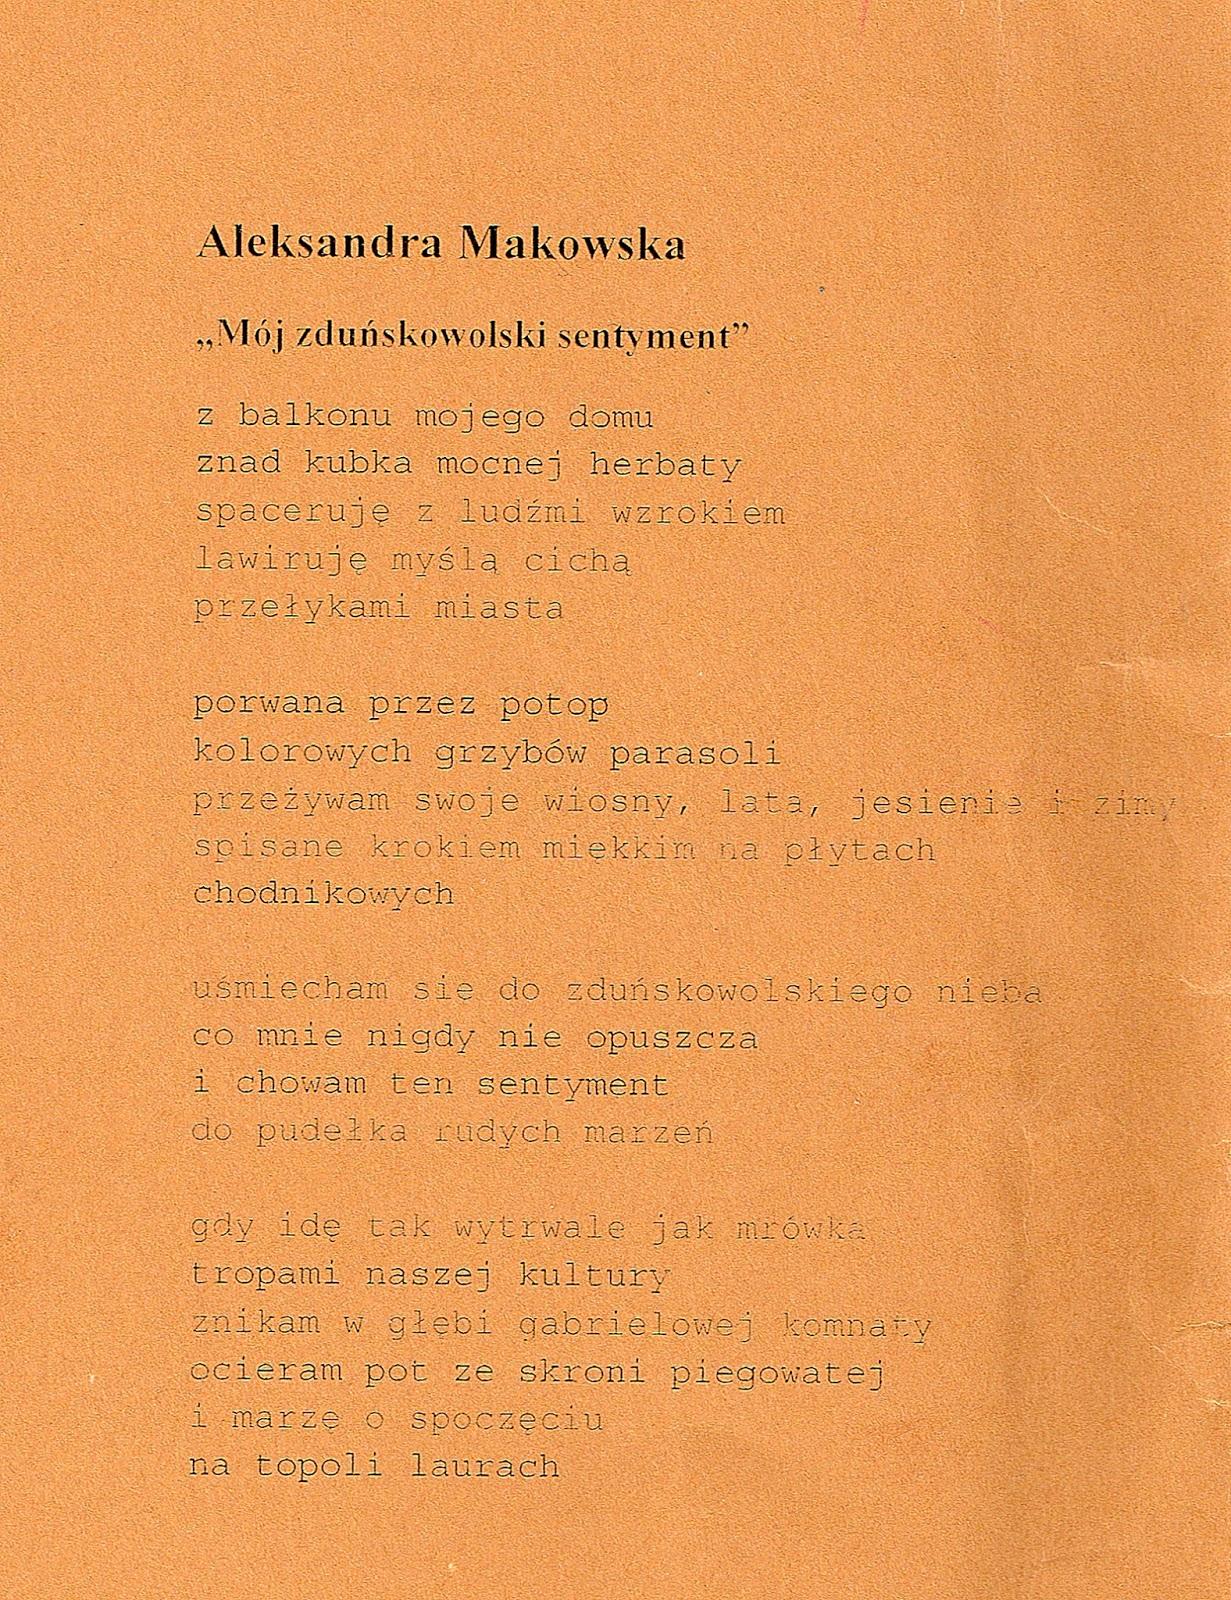 Muzeum Historii Miasta Zduńska Wola Blog Mój Zduńskowolski